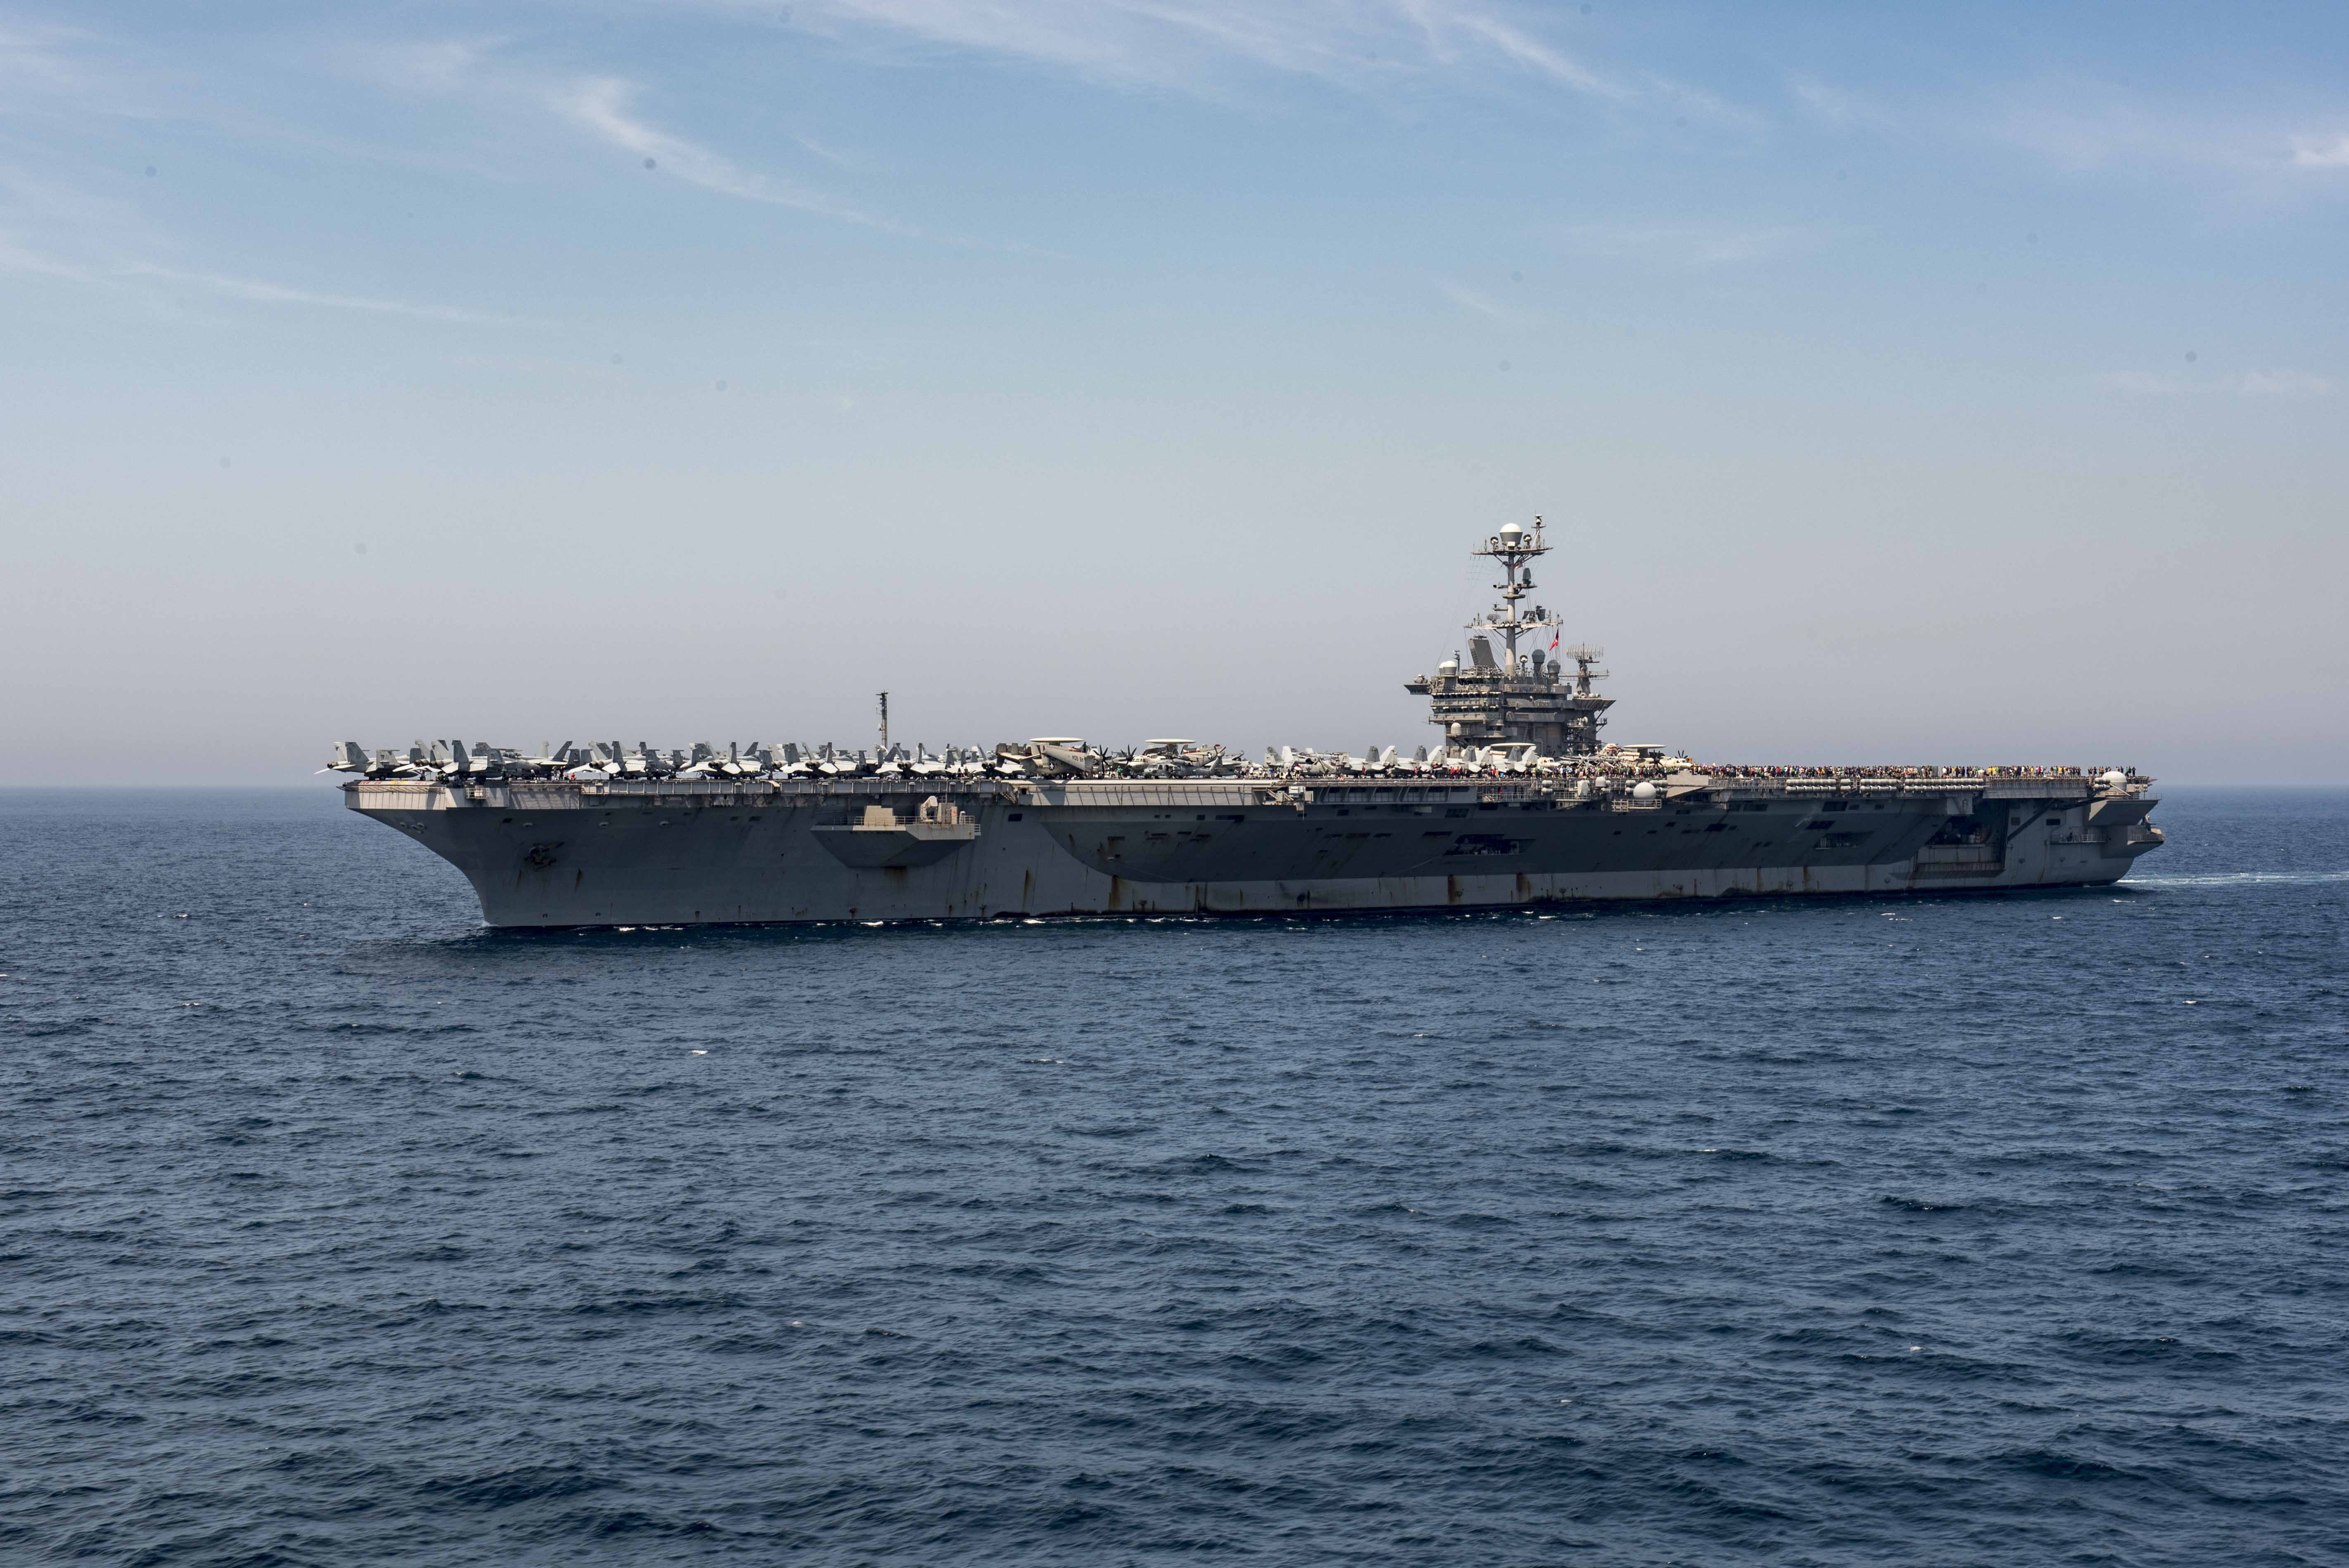 Video Uss Harry S Truman Returns Home After Brief Deployment